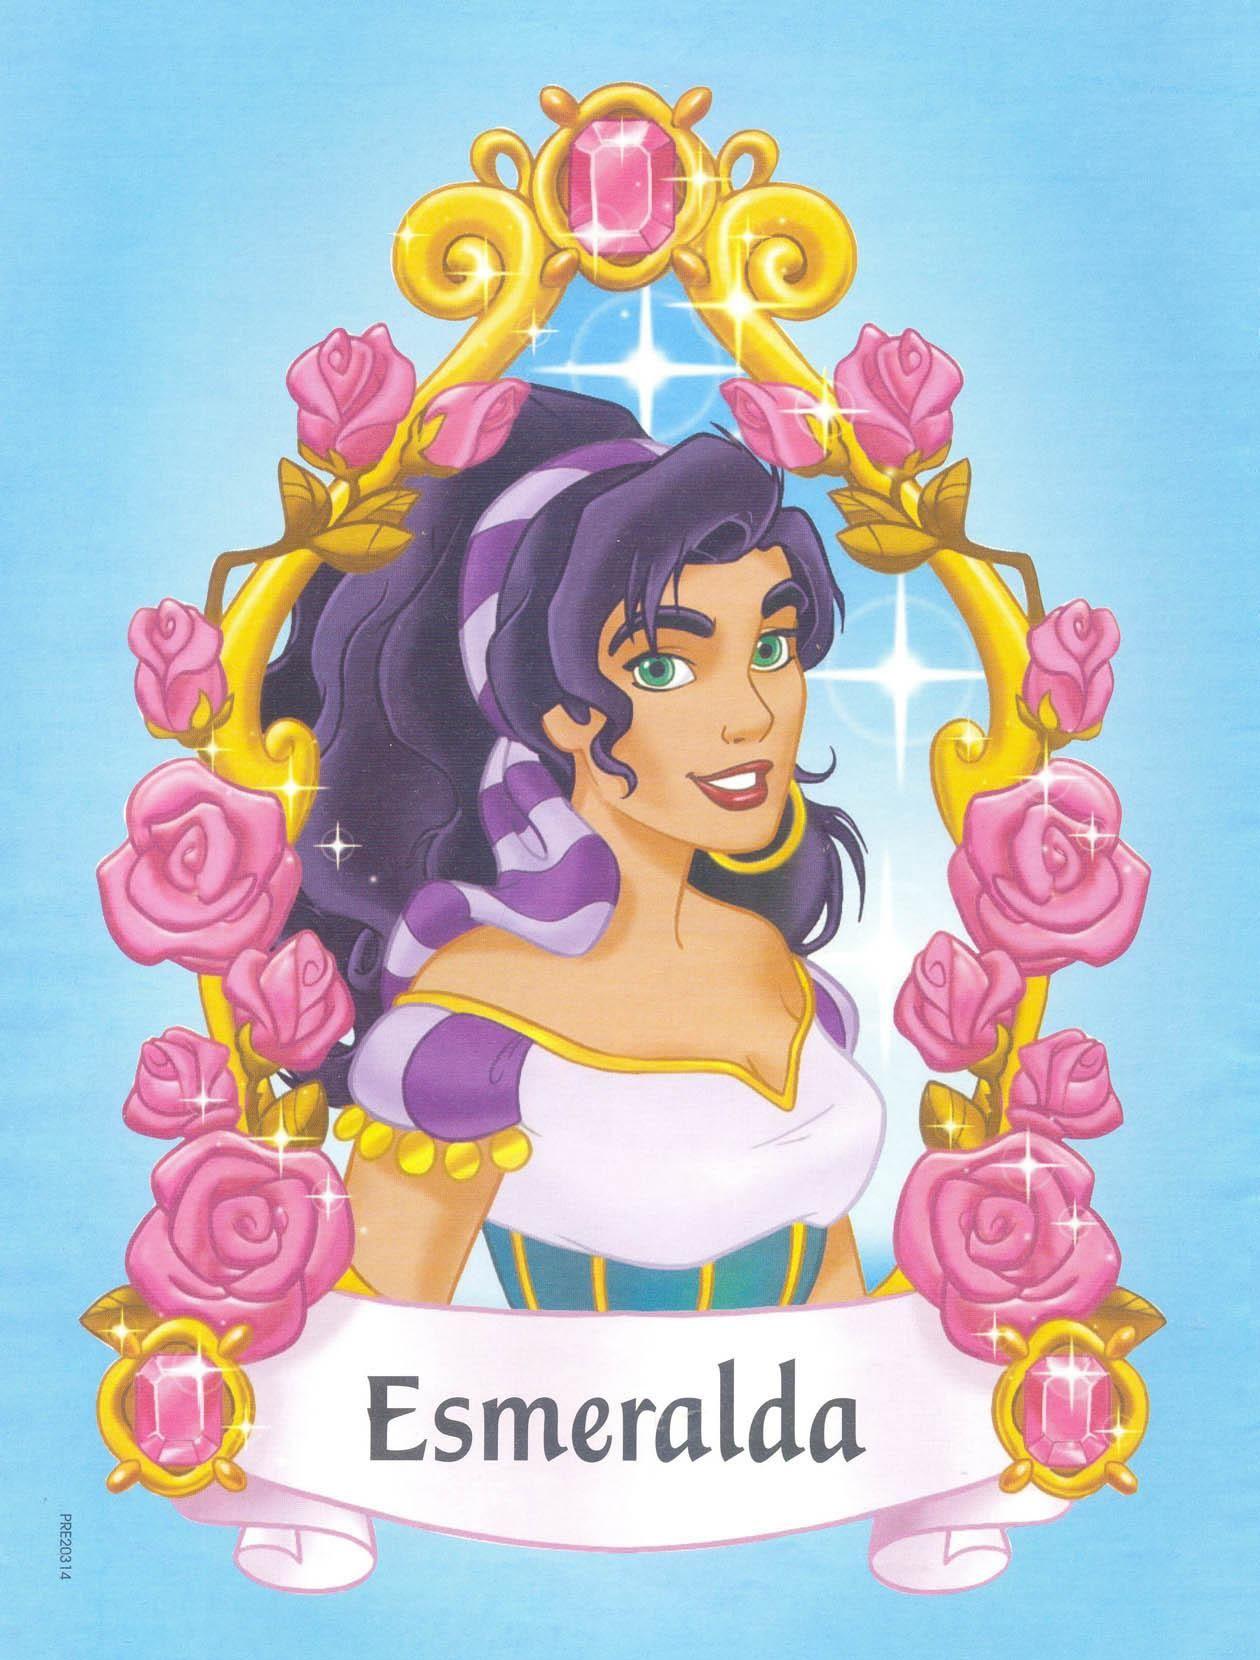 Esmeralda As A Dp Disney Princess 24518770 1260 1660 Jpg